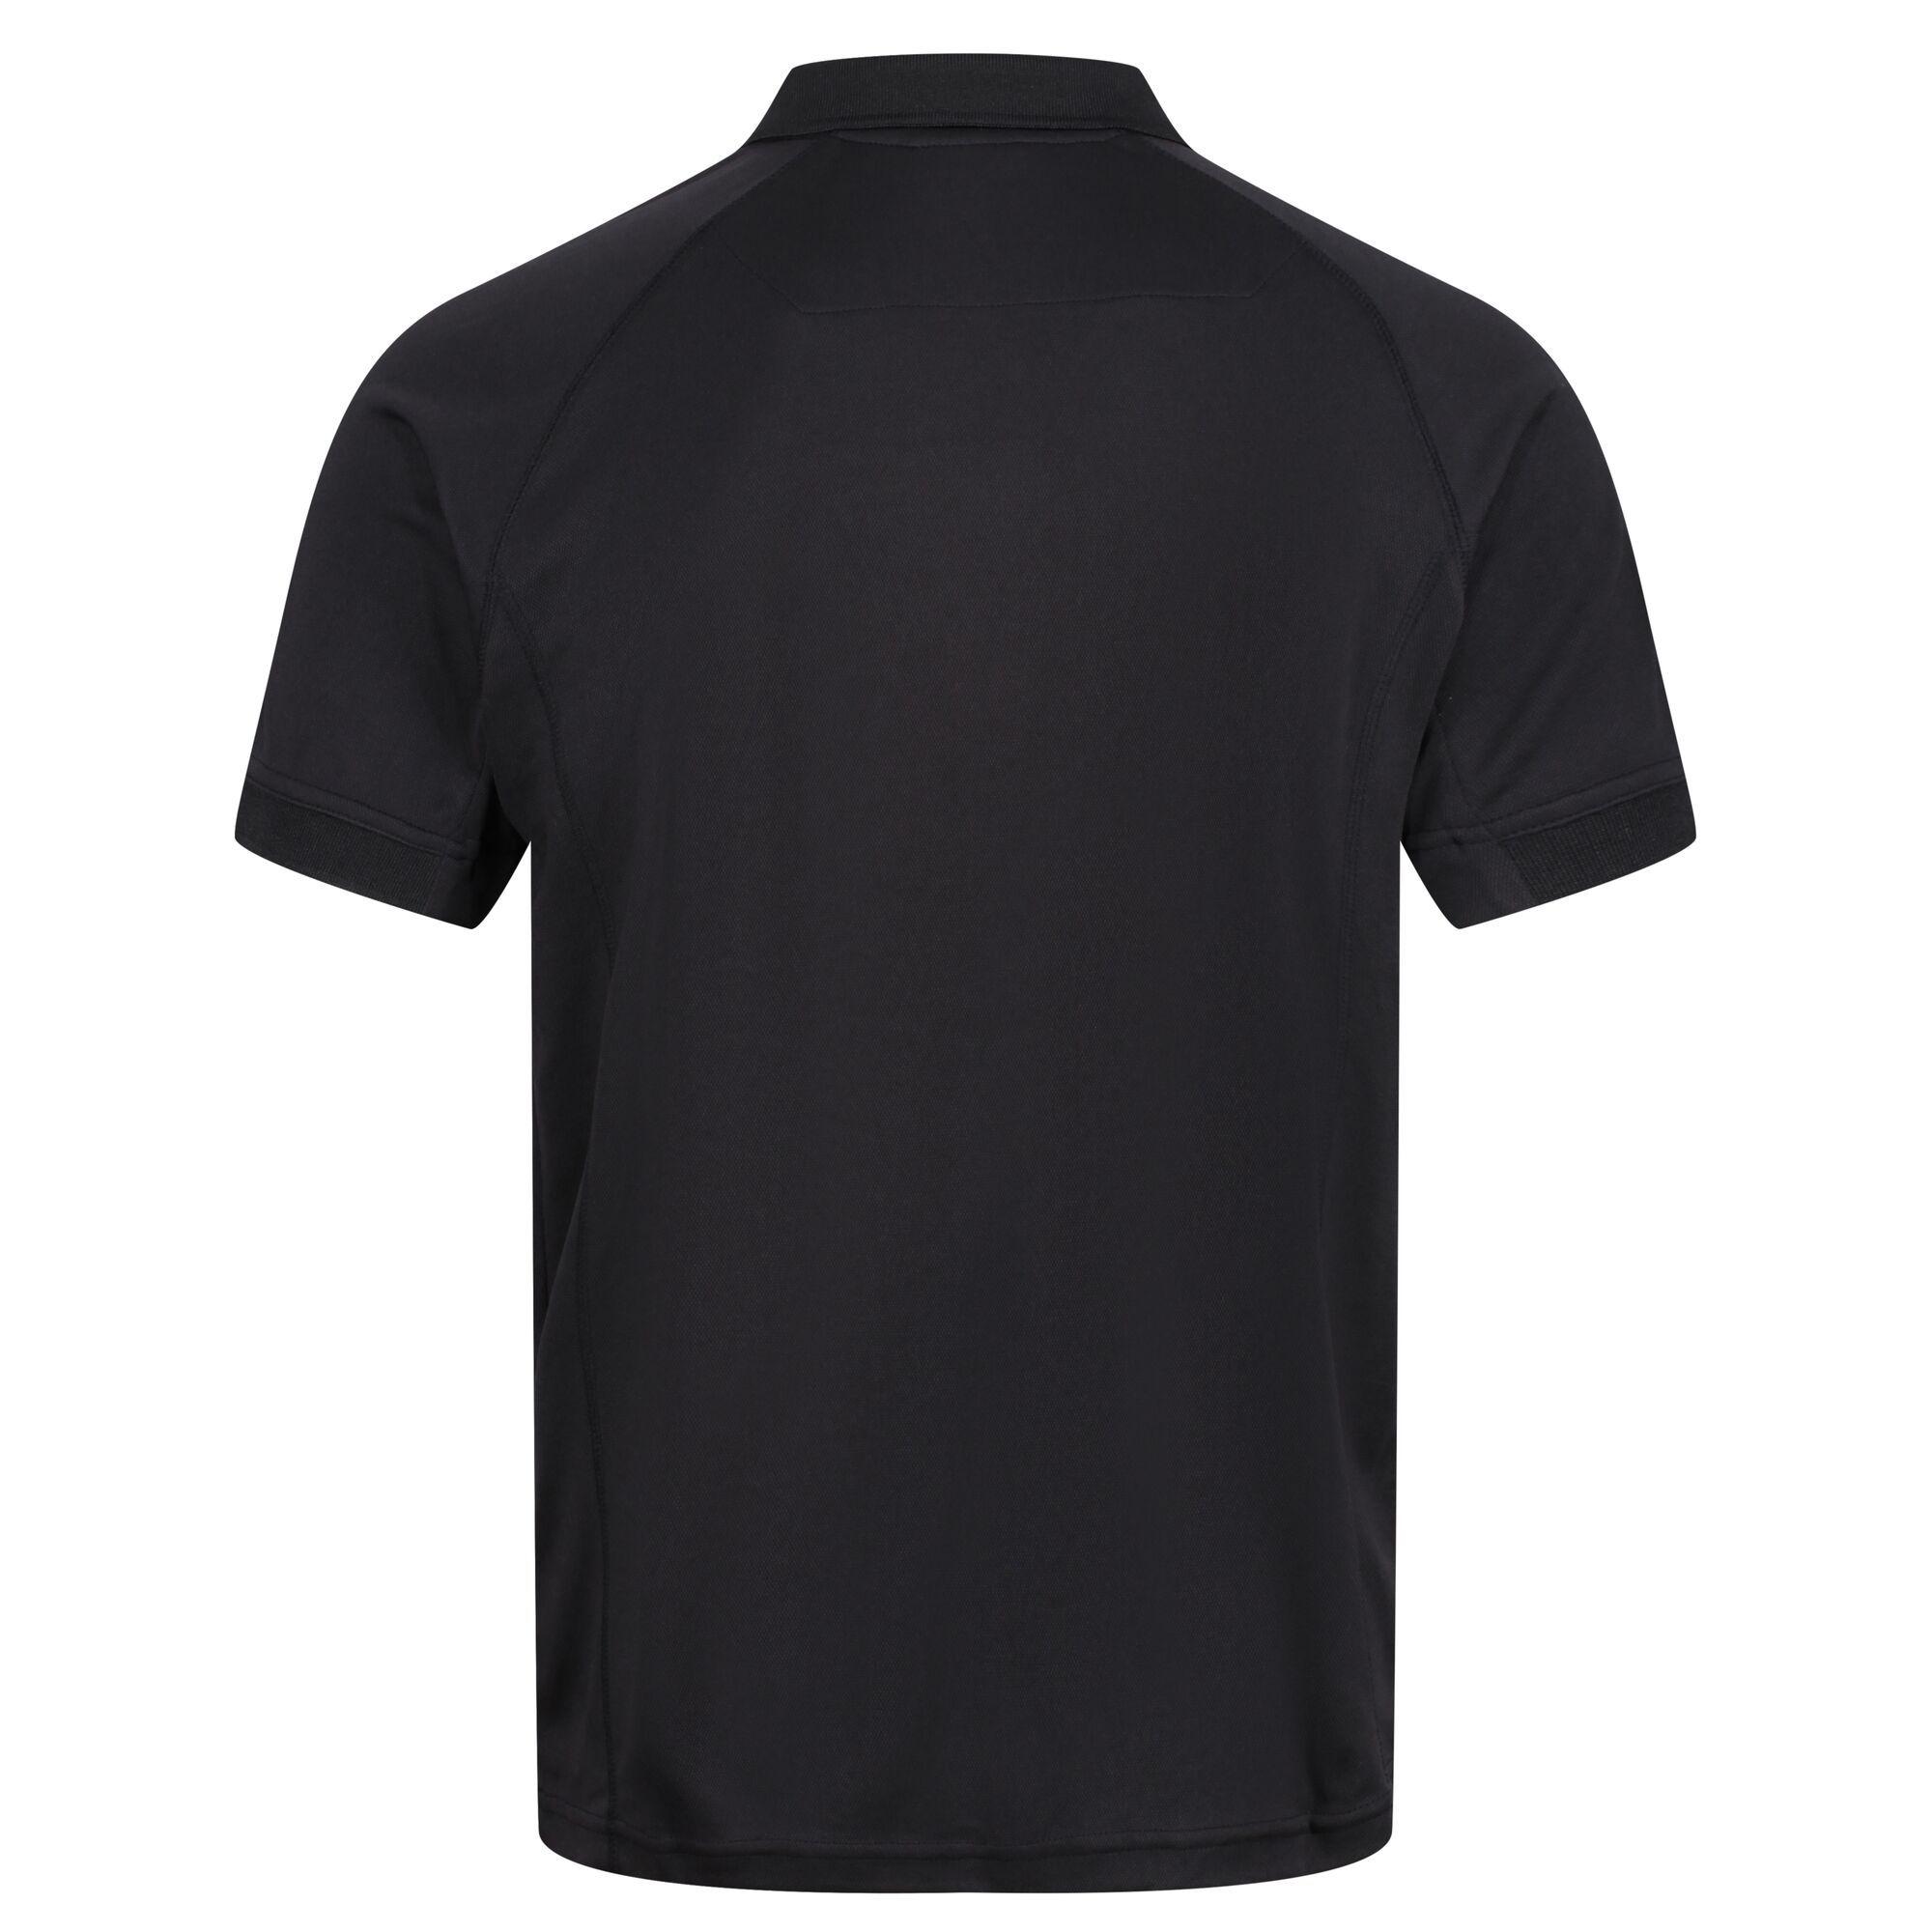 Regatta-Profesional-para-Hombre-Tejido-Manga-Corta-Camisa-de-Polo-RG2161 miniatura 18